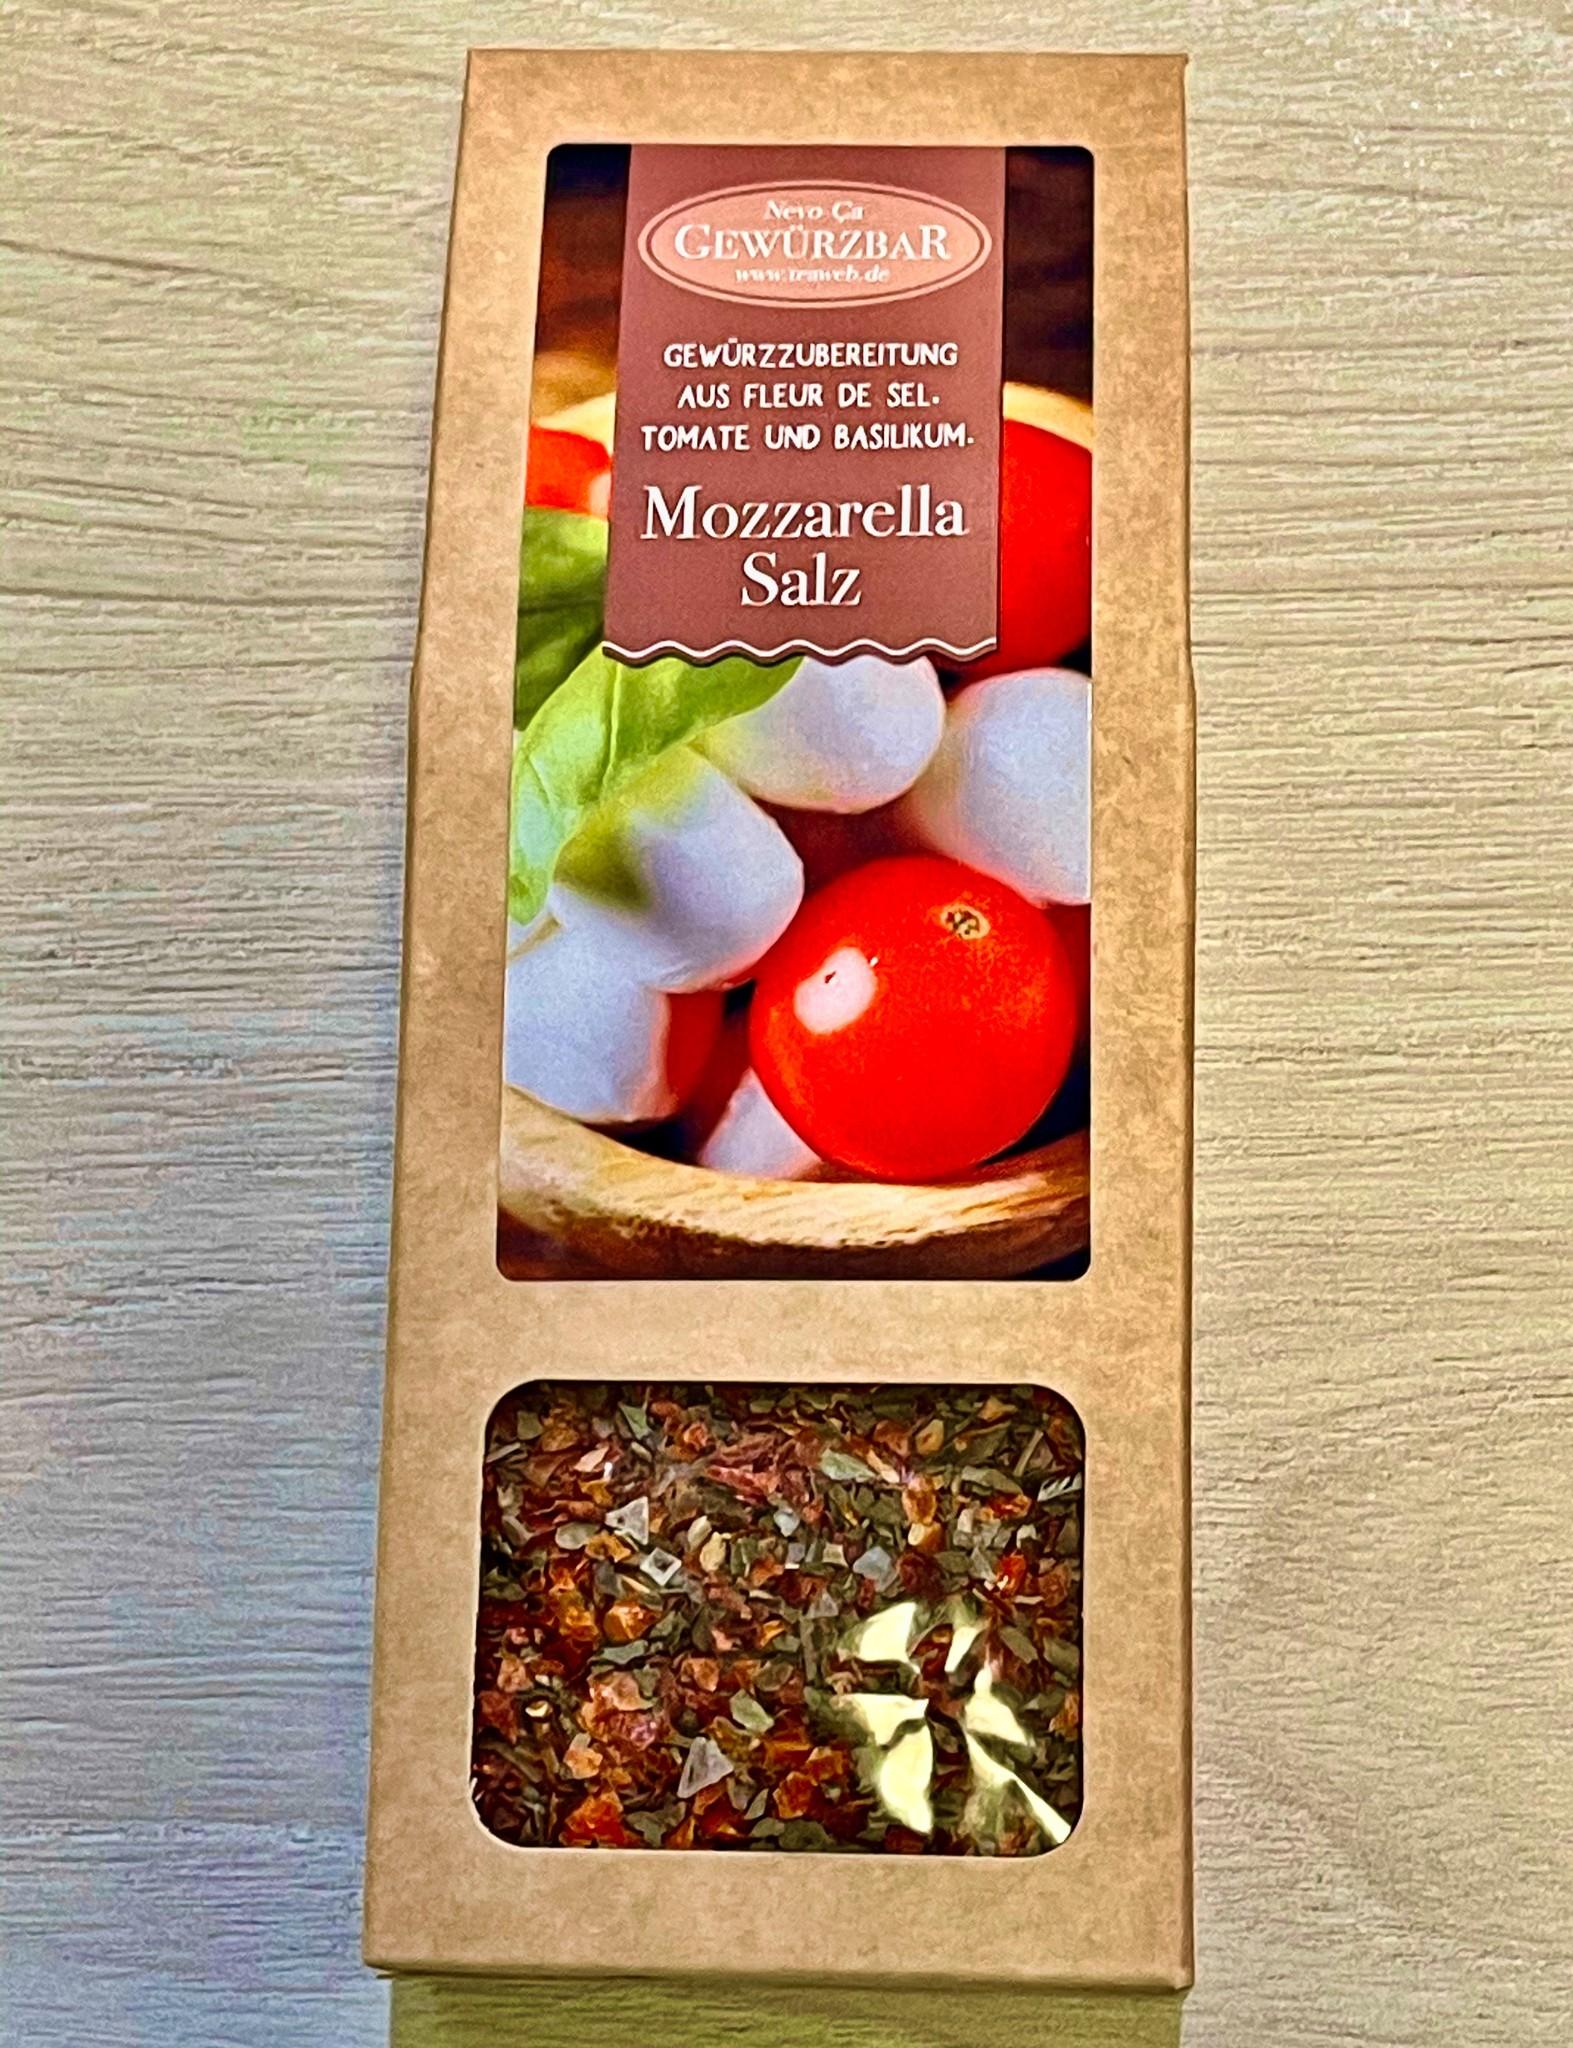 Mozarella Salz